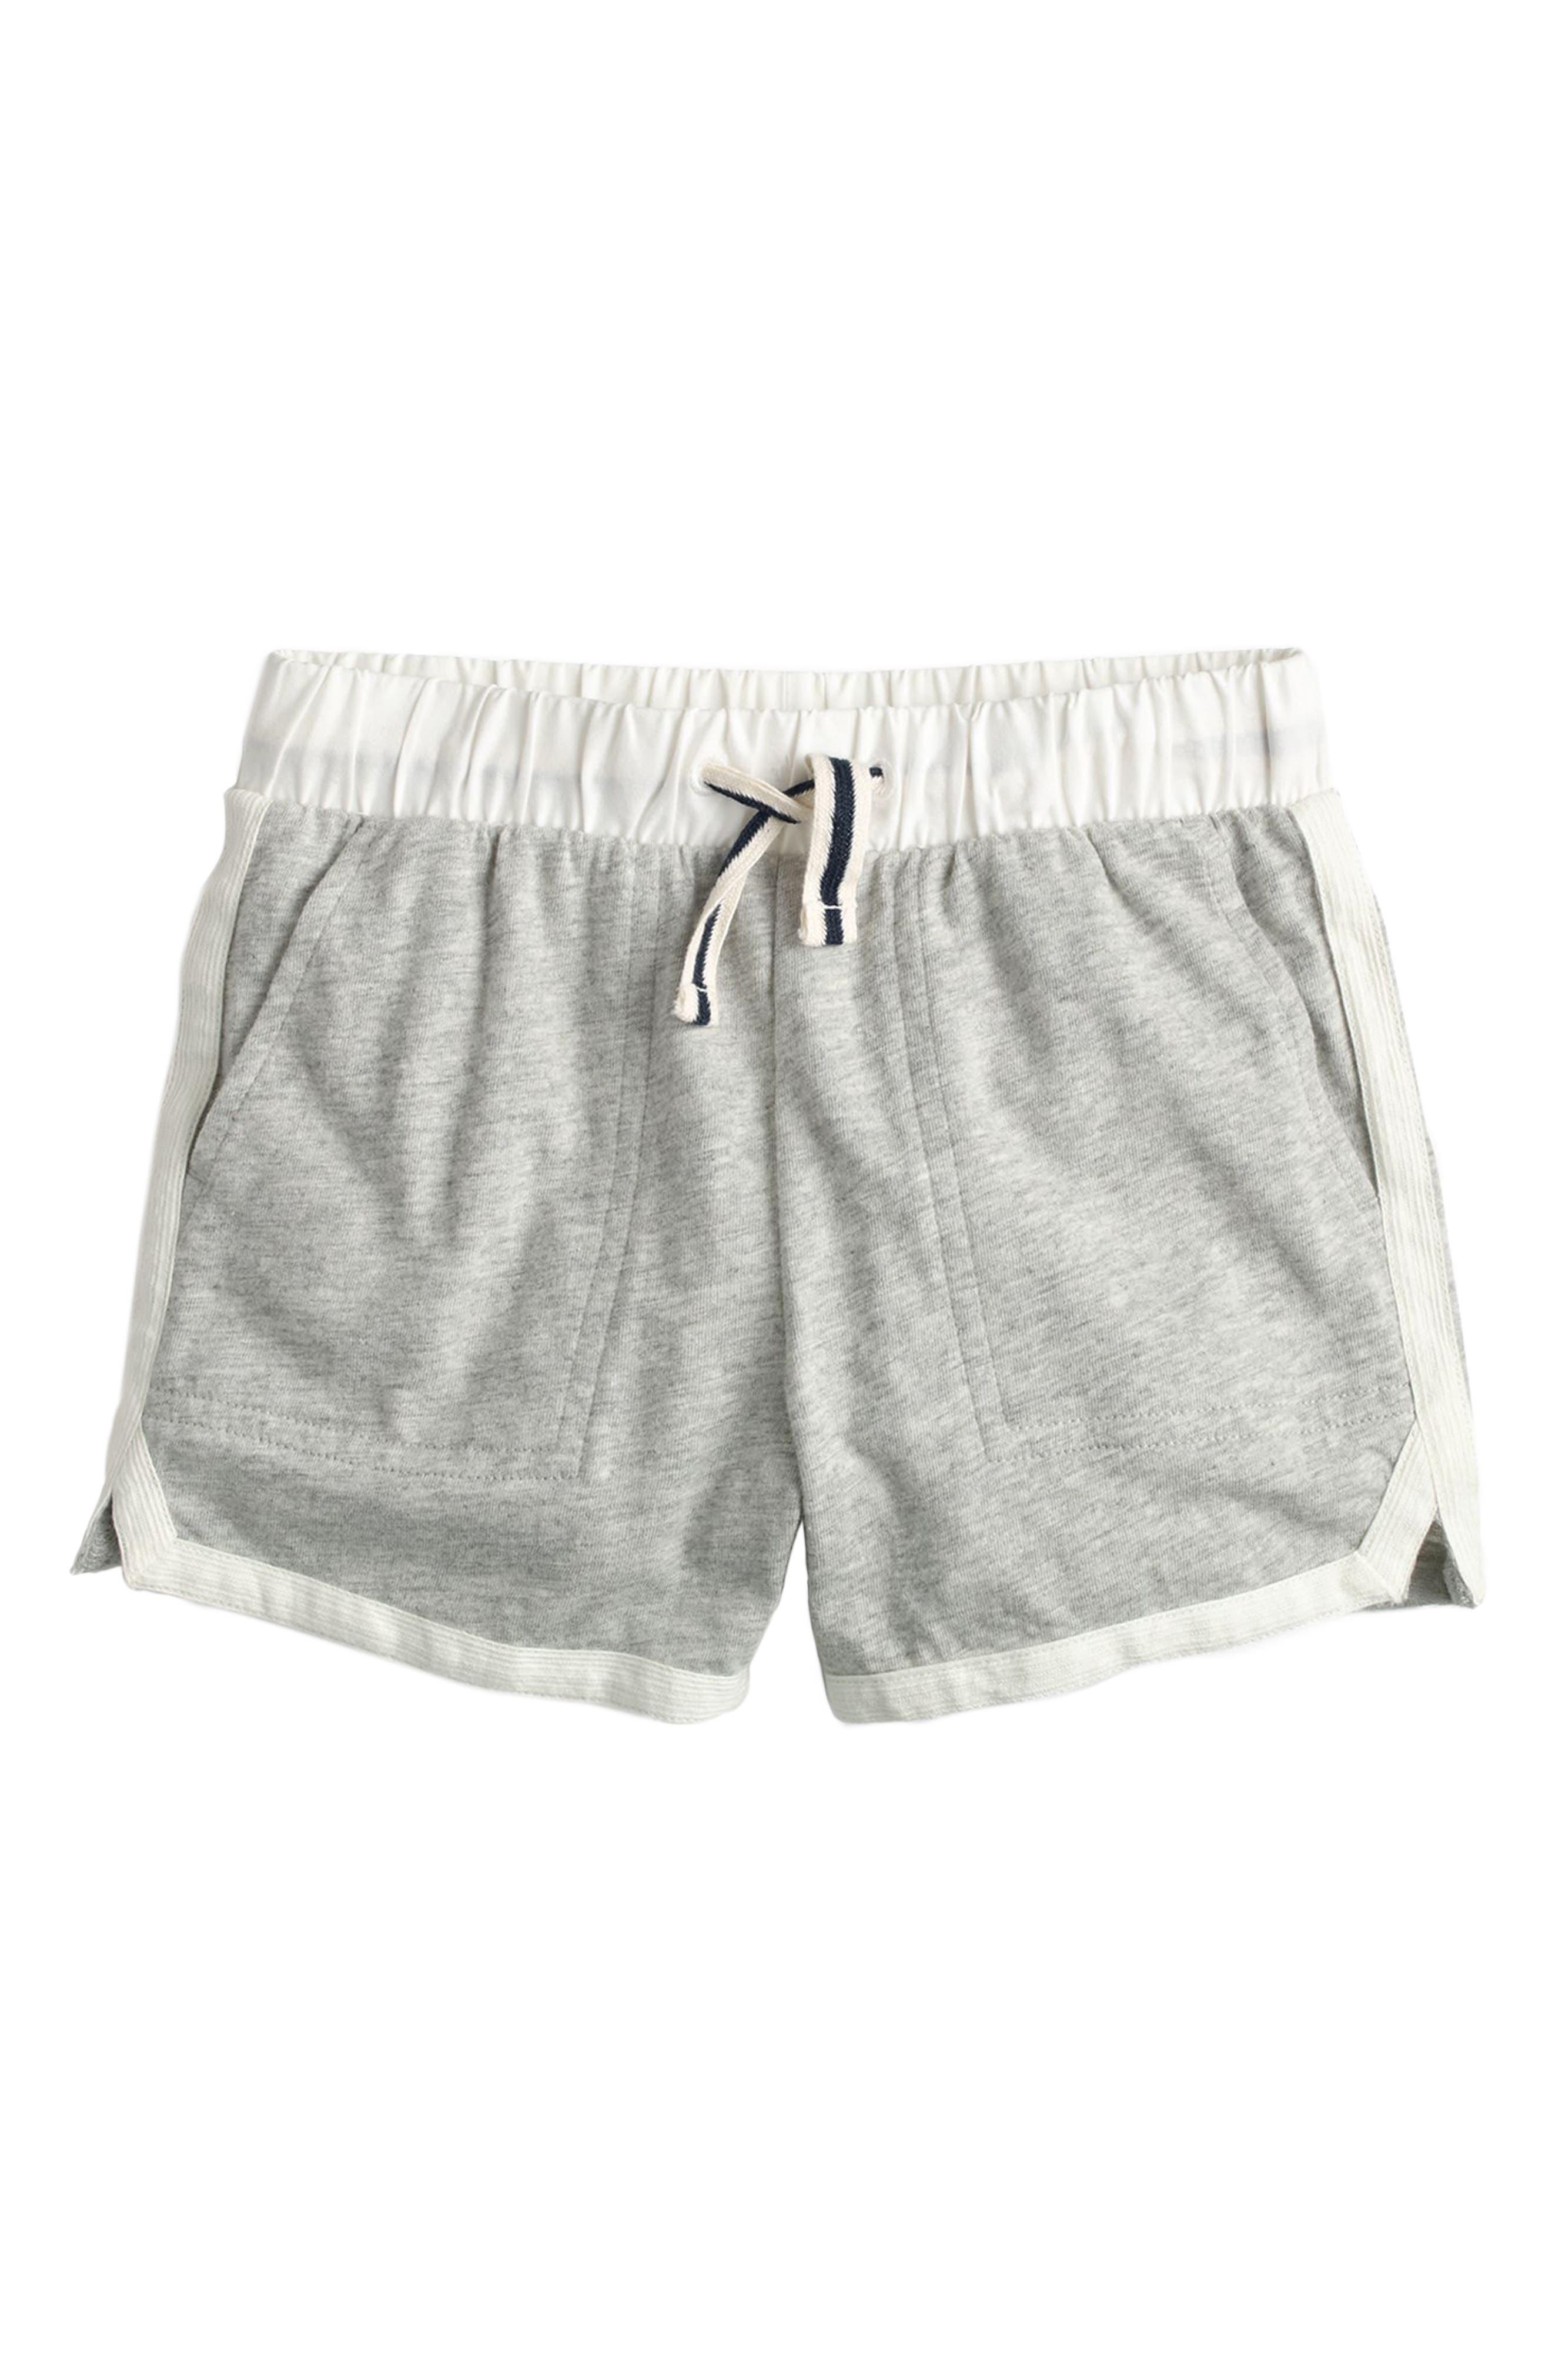 CREWCUTS BY J.CREW Ester Cotton Shorts, Main, color, 020